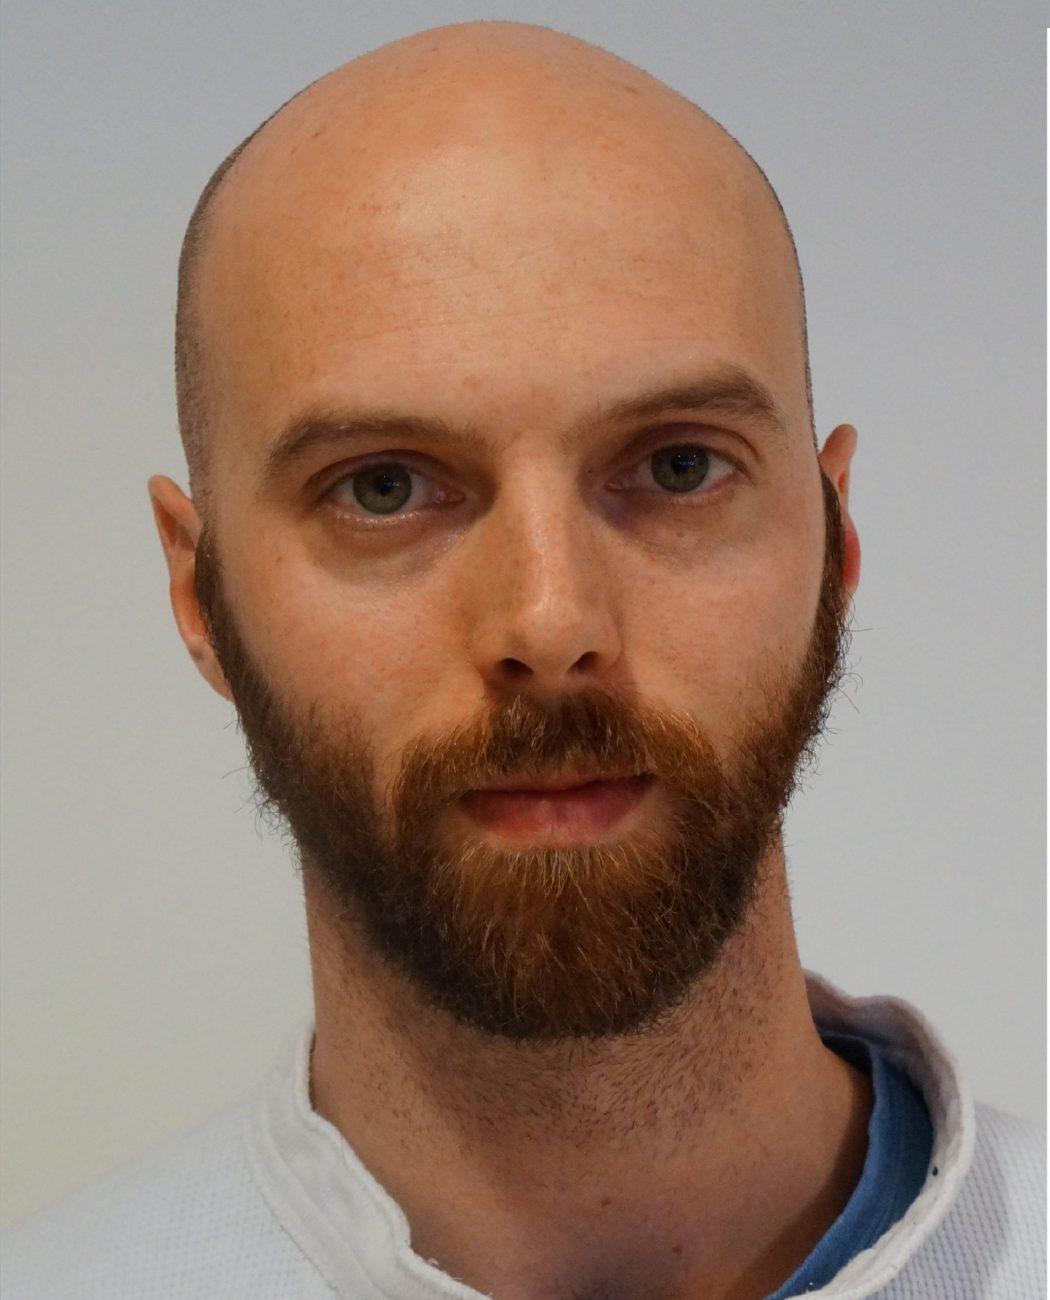 Marius Engebretsen bilde 2020